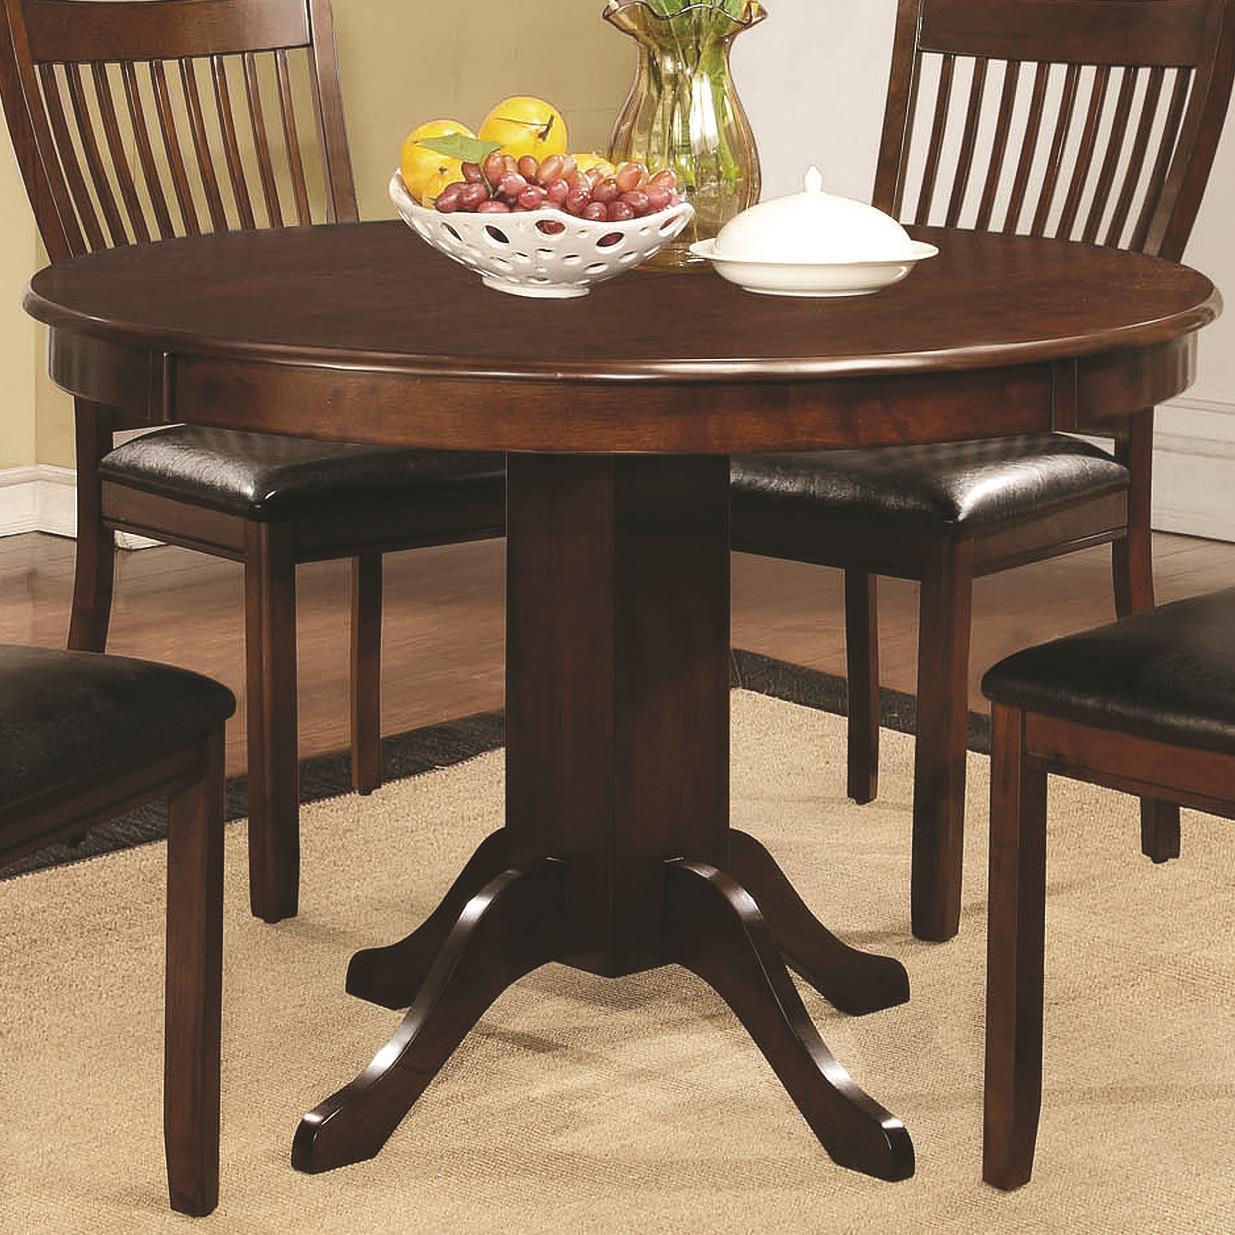 Coaster Sierra Dining Table - Item Number: 105750